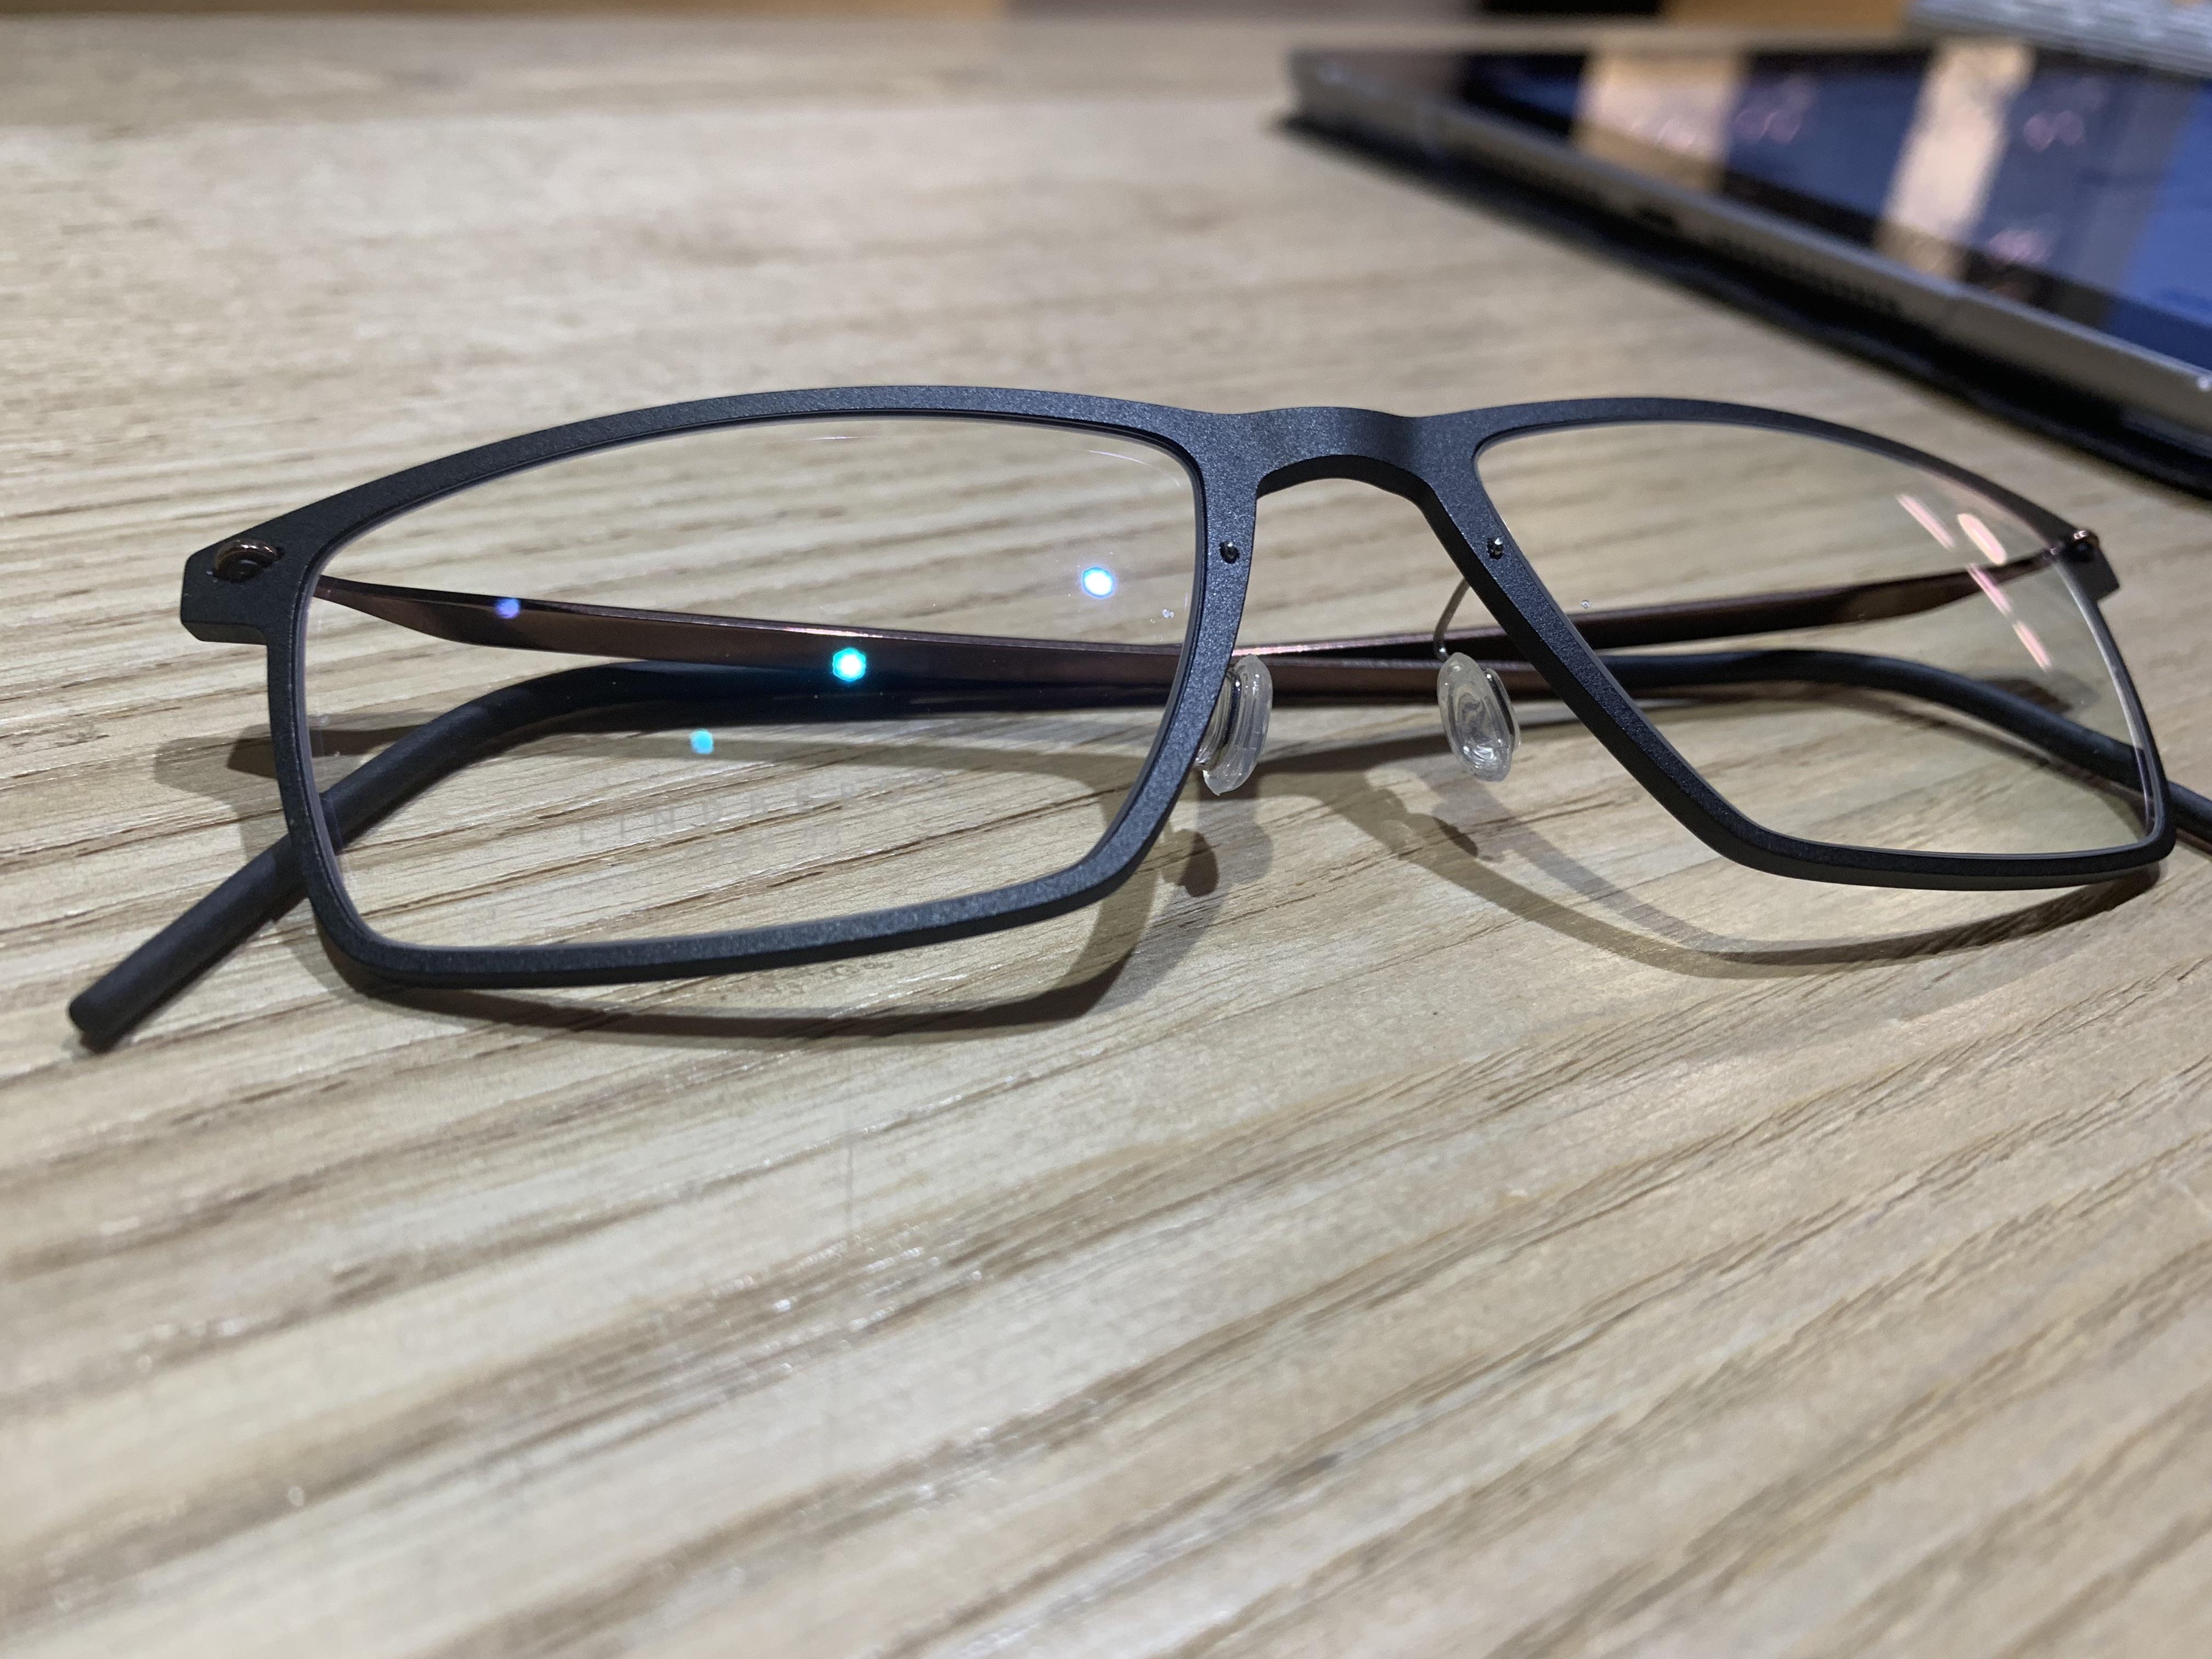 Lindberg眼鏡的鏡框